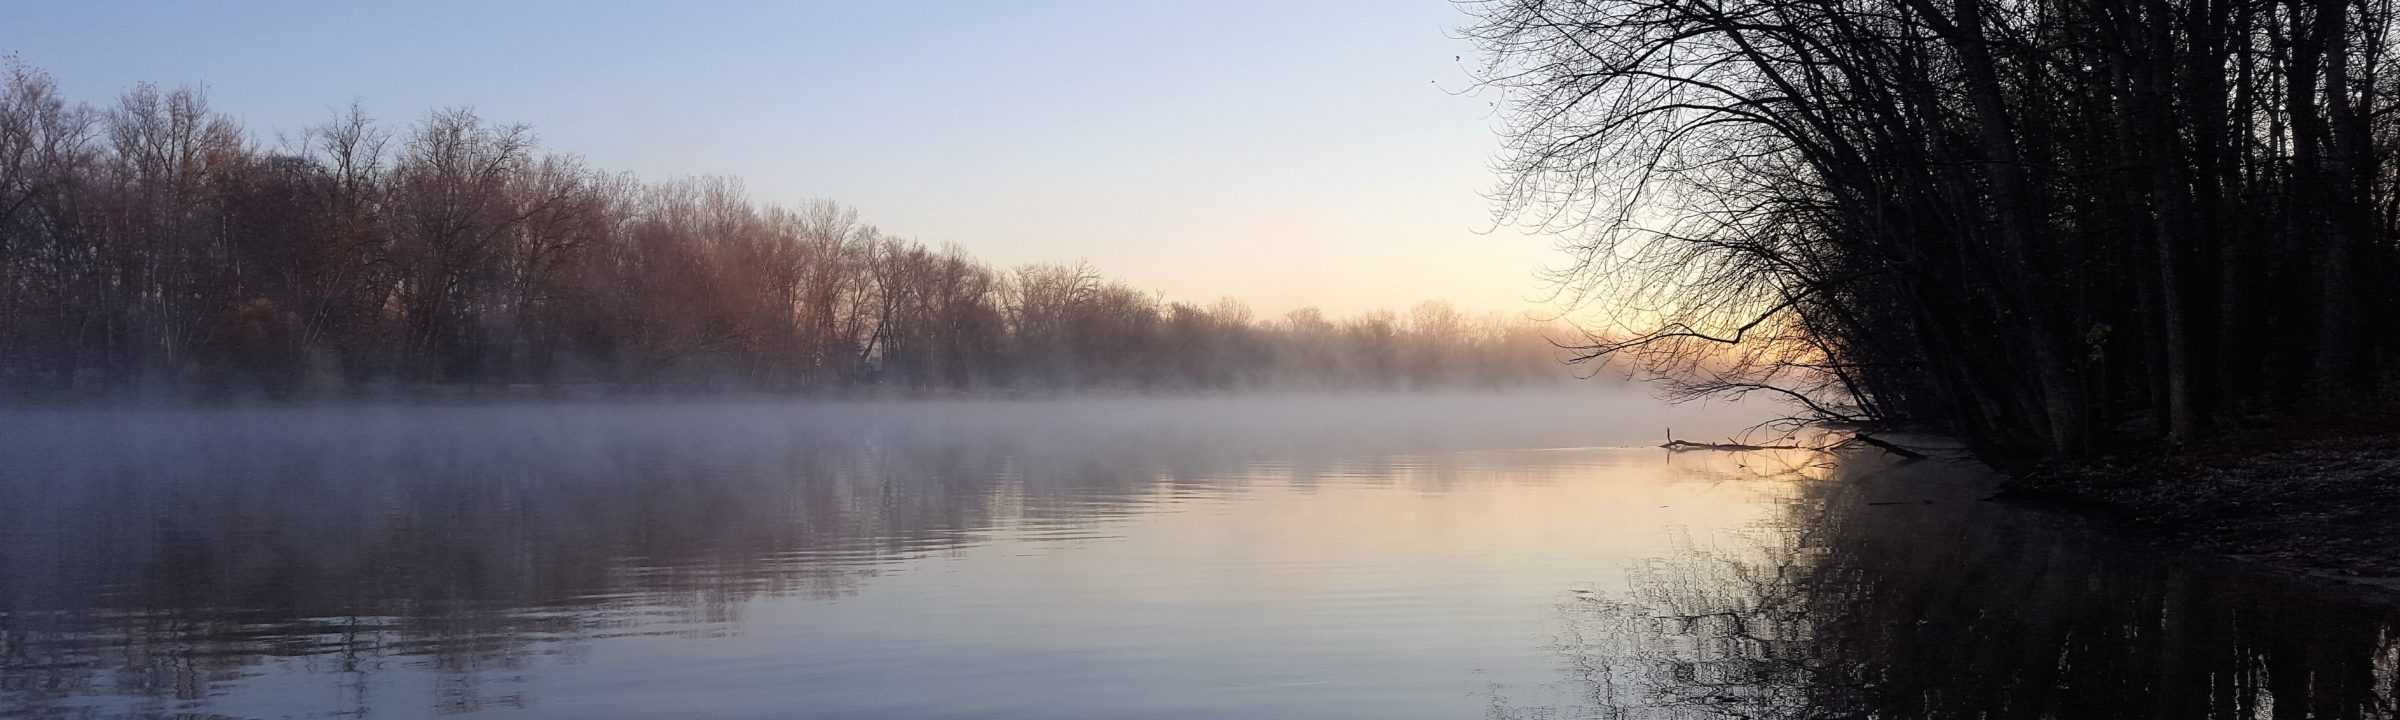 River Trek Guide Service